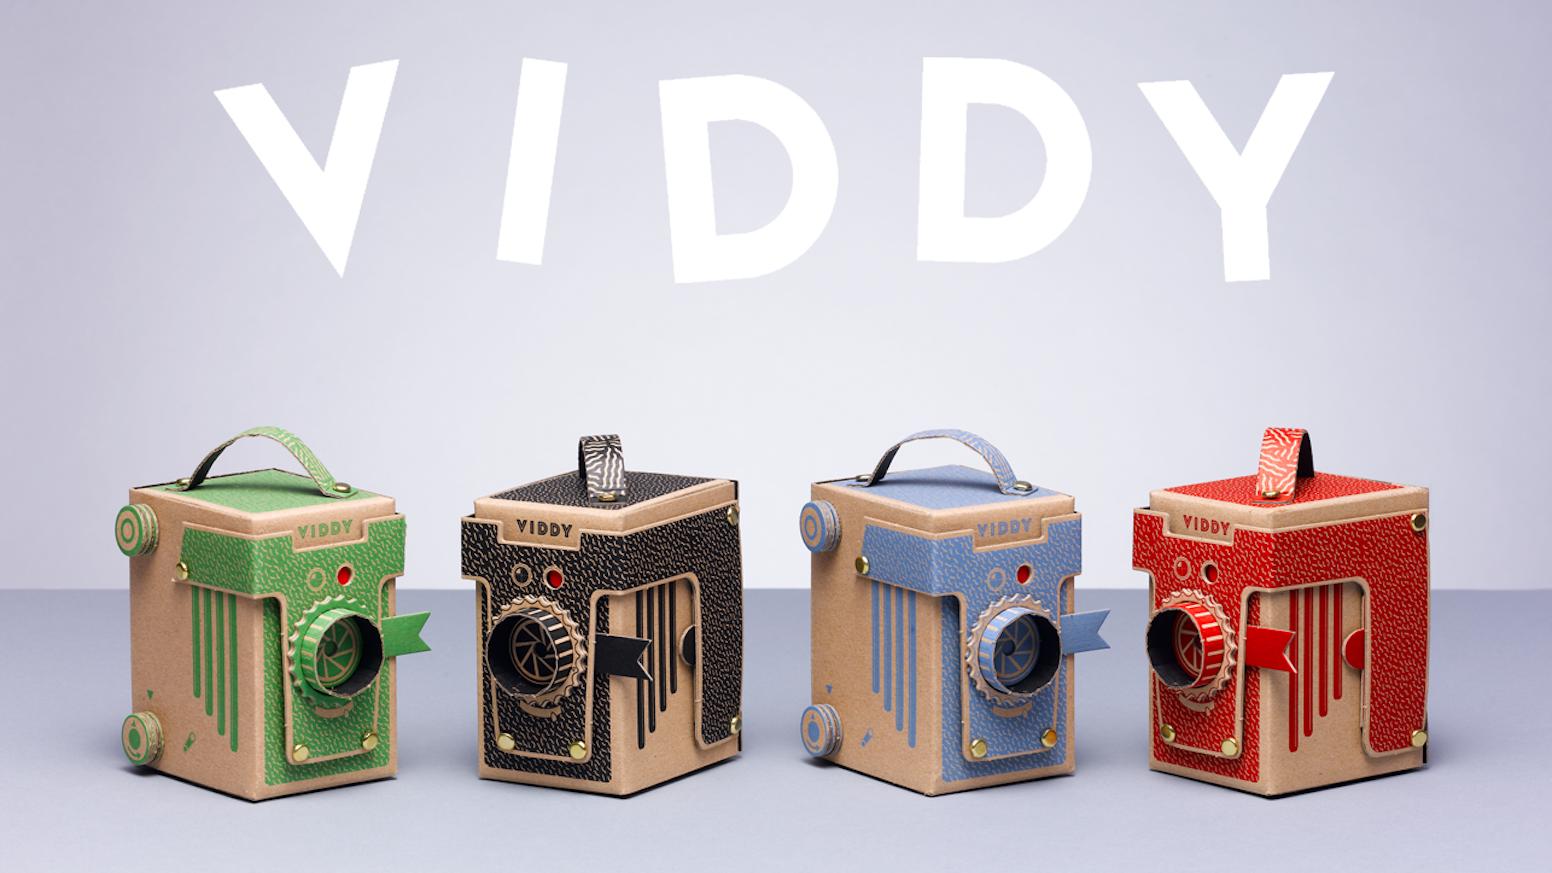 Viddy The Worlds Cutest Diy Pinhole Camera By Kelly Angood